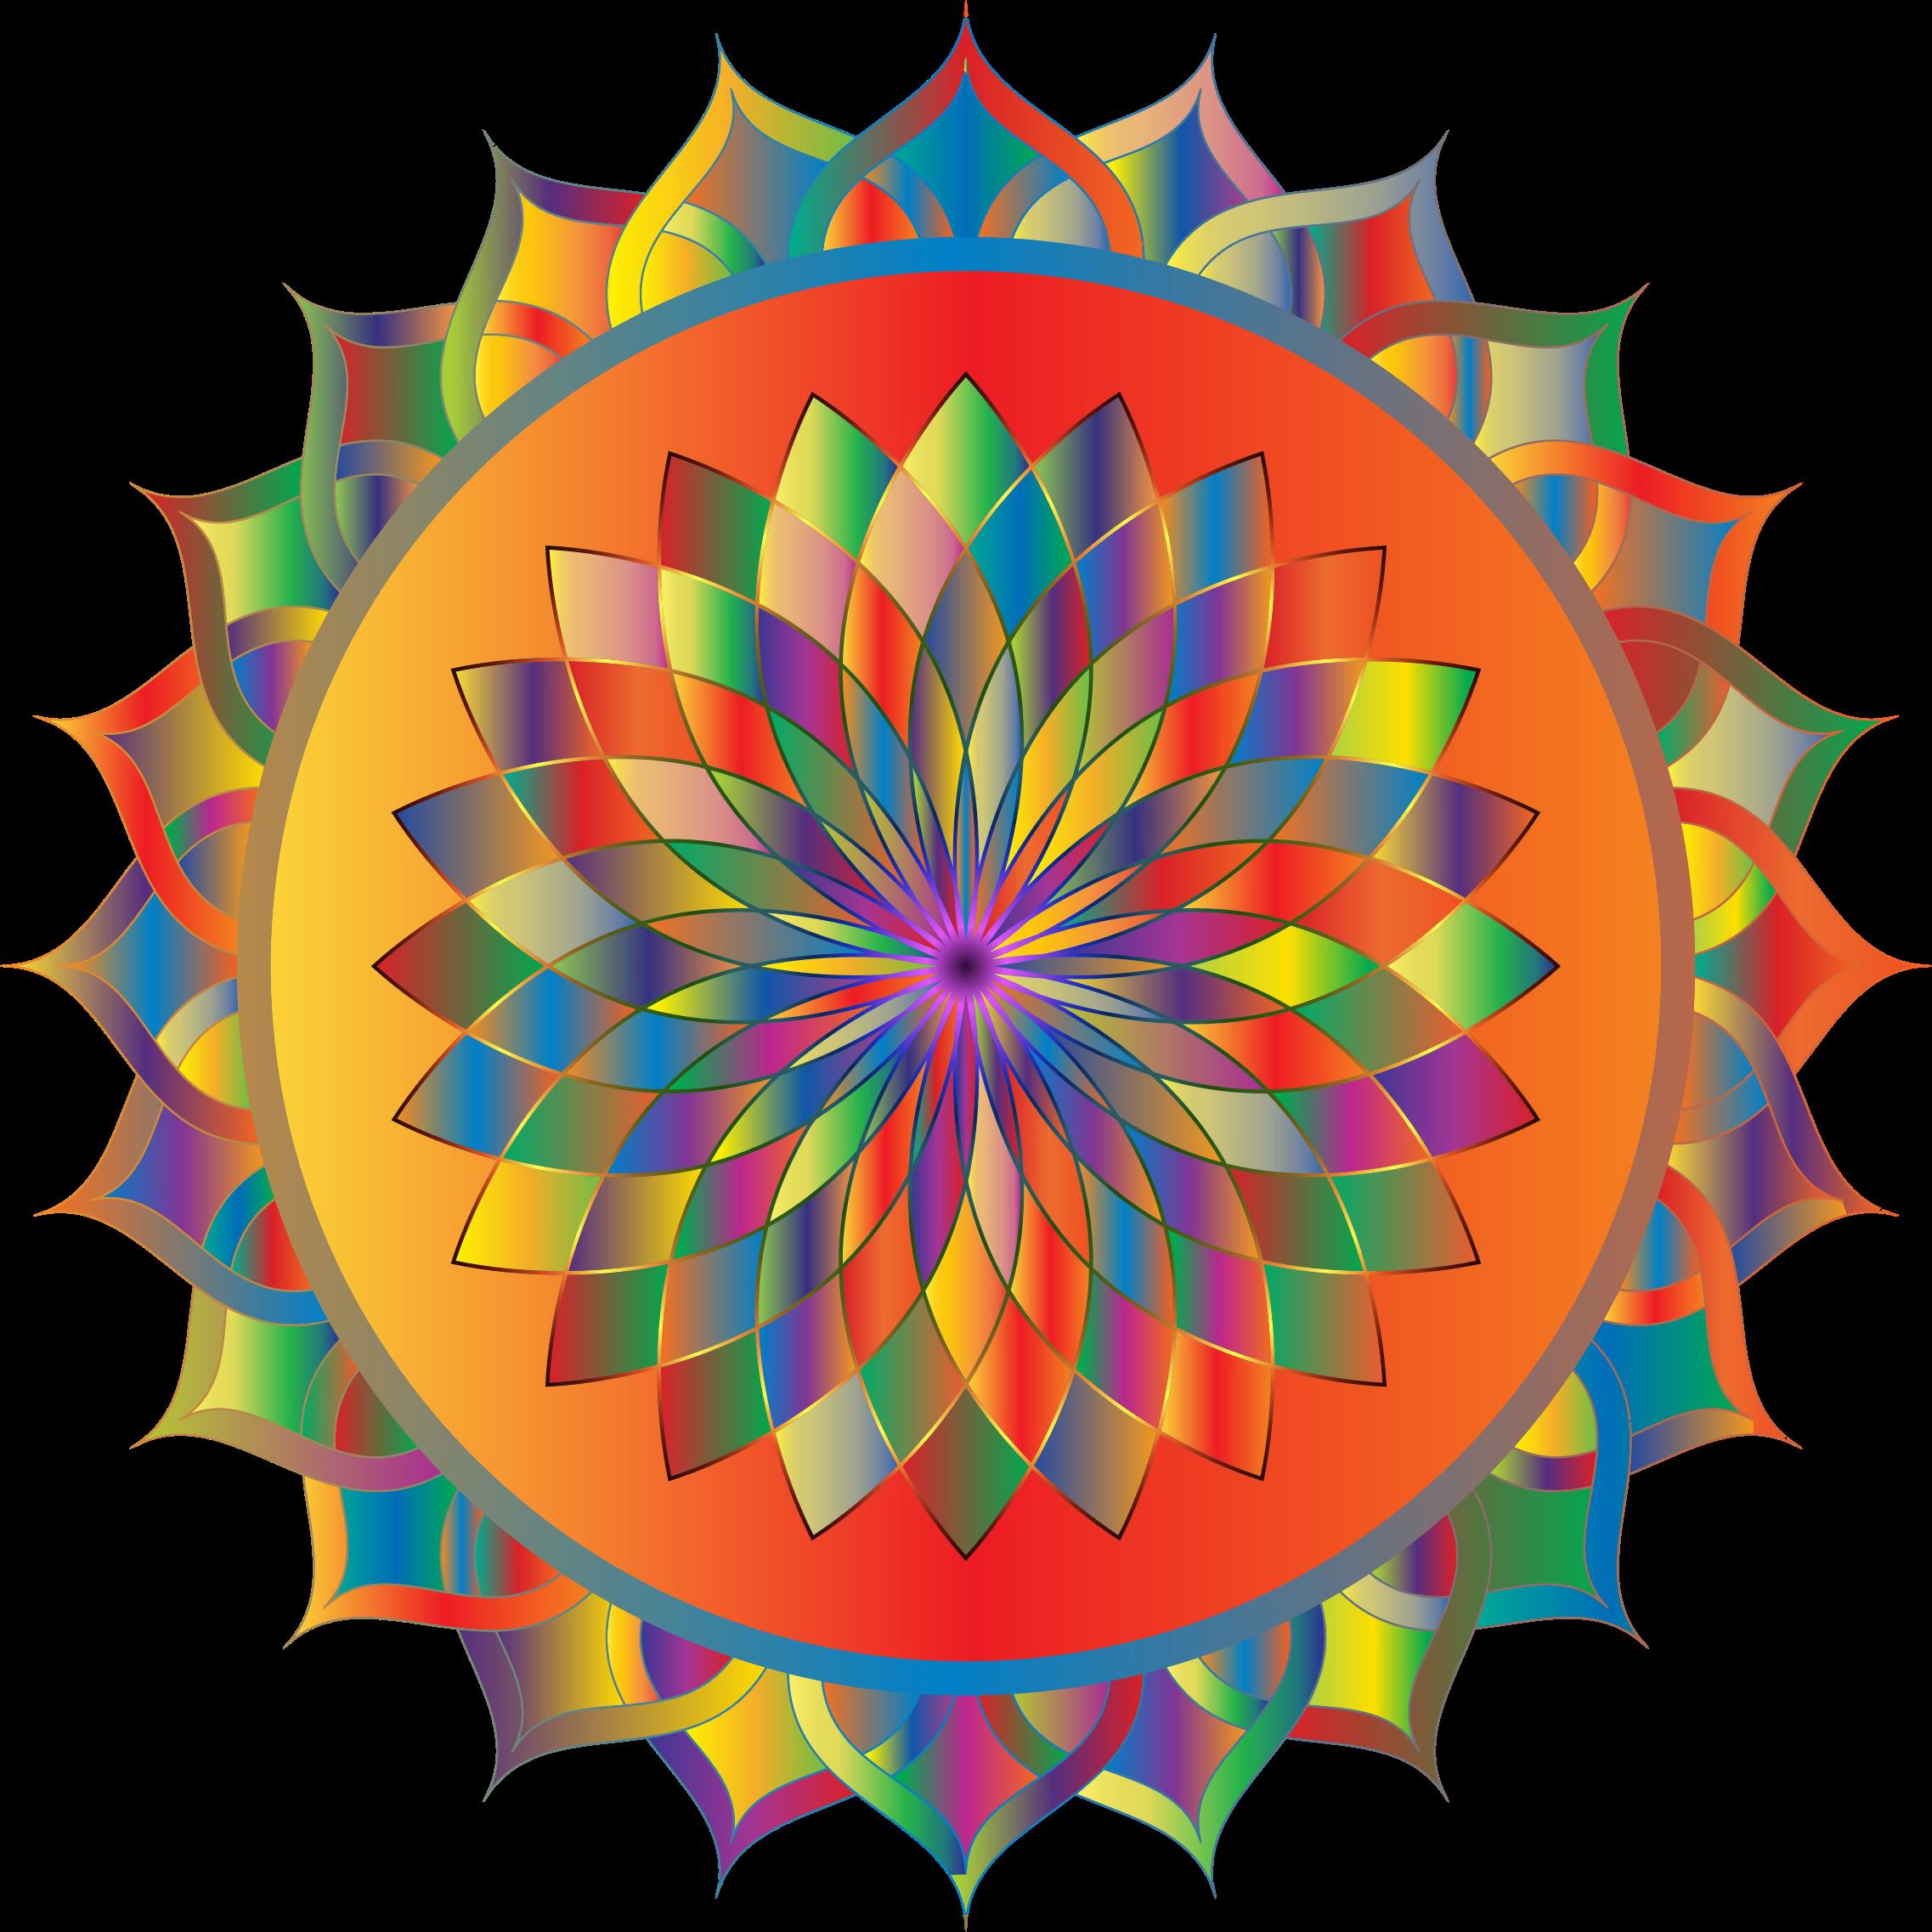 ... Clipart - Prismatic Mandala Line Art 3 ...